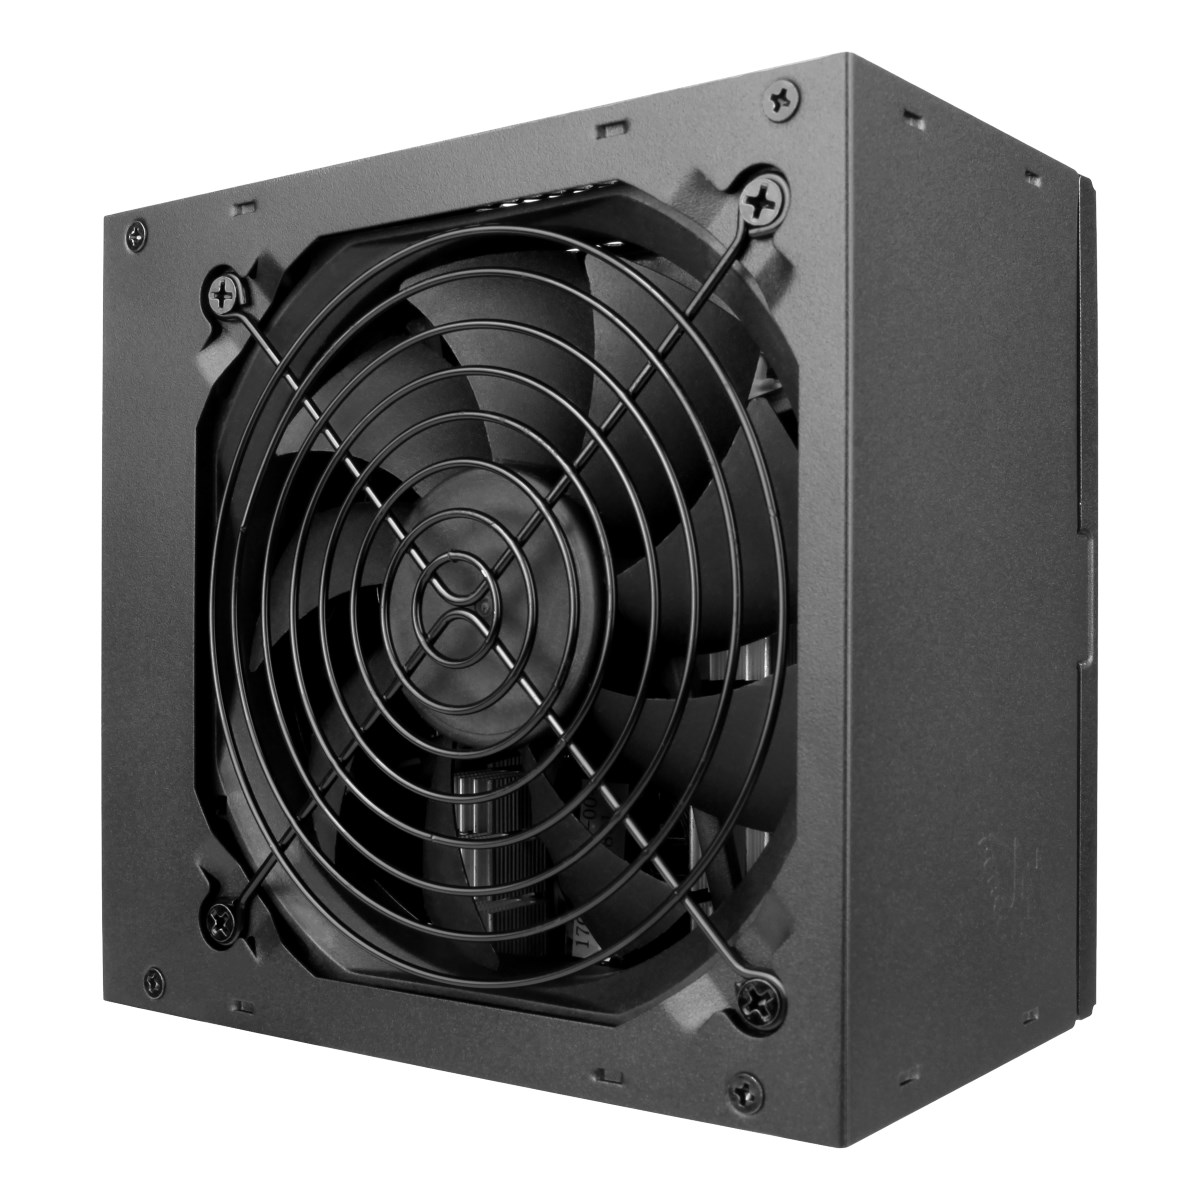 POWERTECH τροφοδοτικό για PC PT-906, 750W, Active PFC - POWERTECH 22569